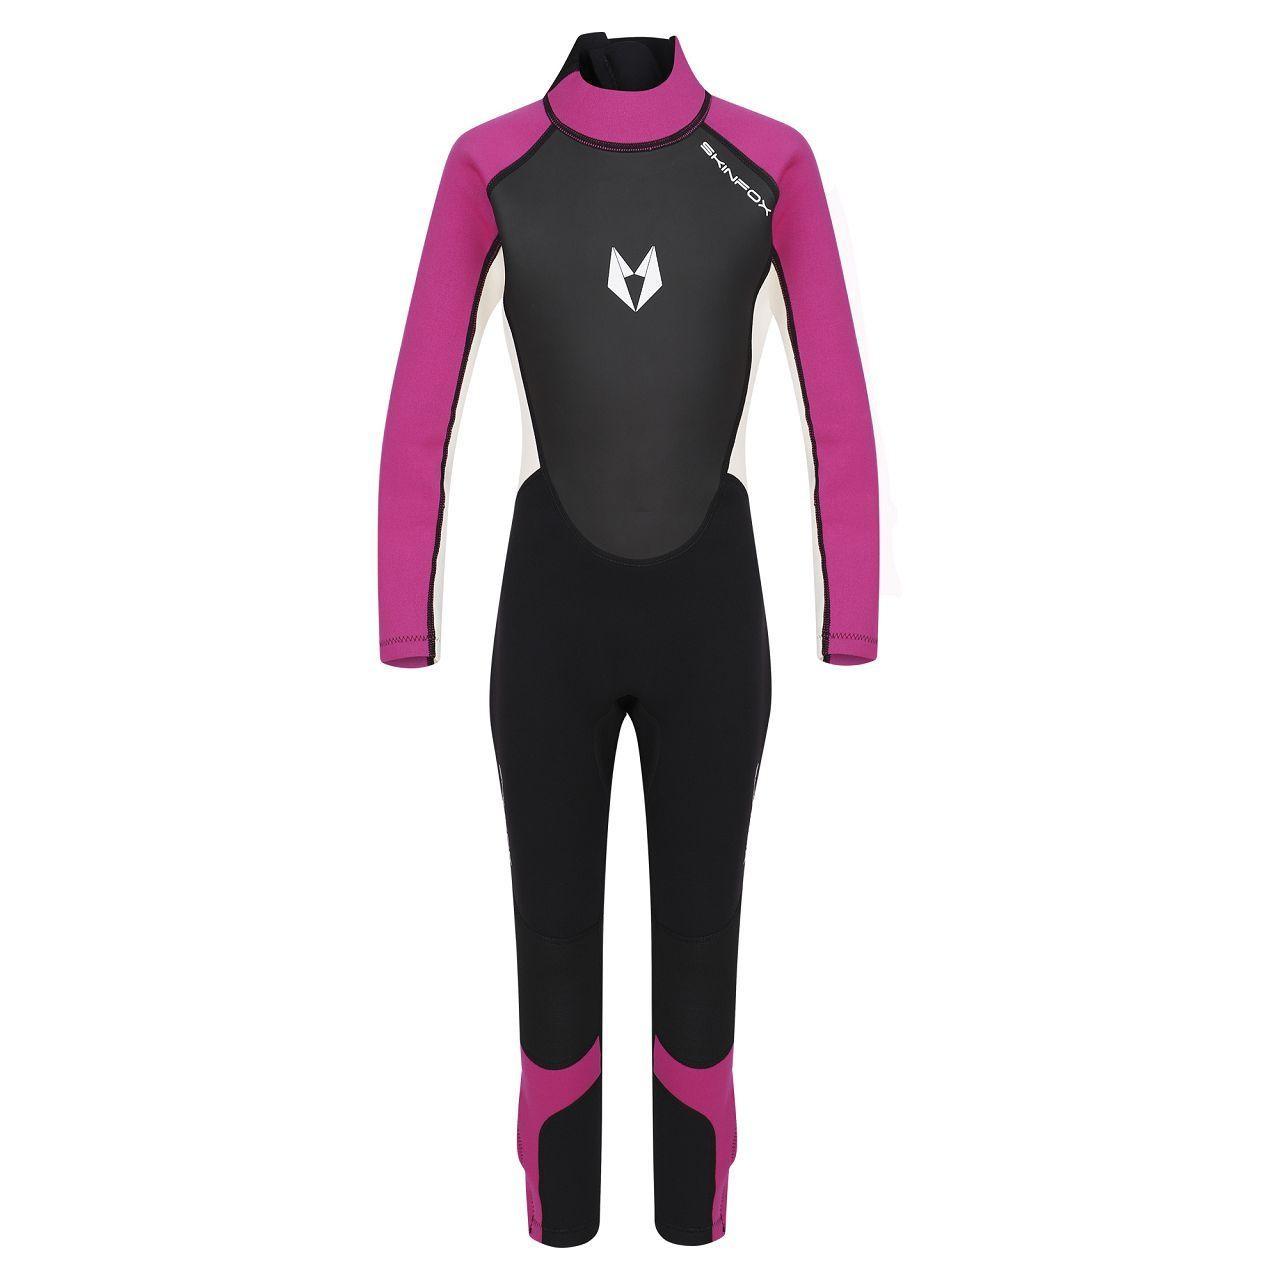 SKINFOX SCOUT 1-16 J. Kinder Full Suit Neoprenanzug Schwimmanzug pink